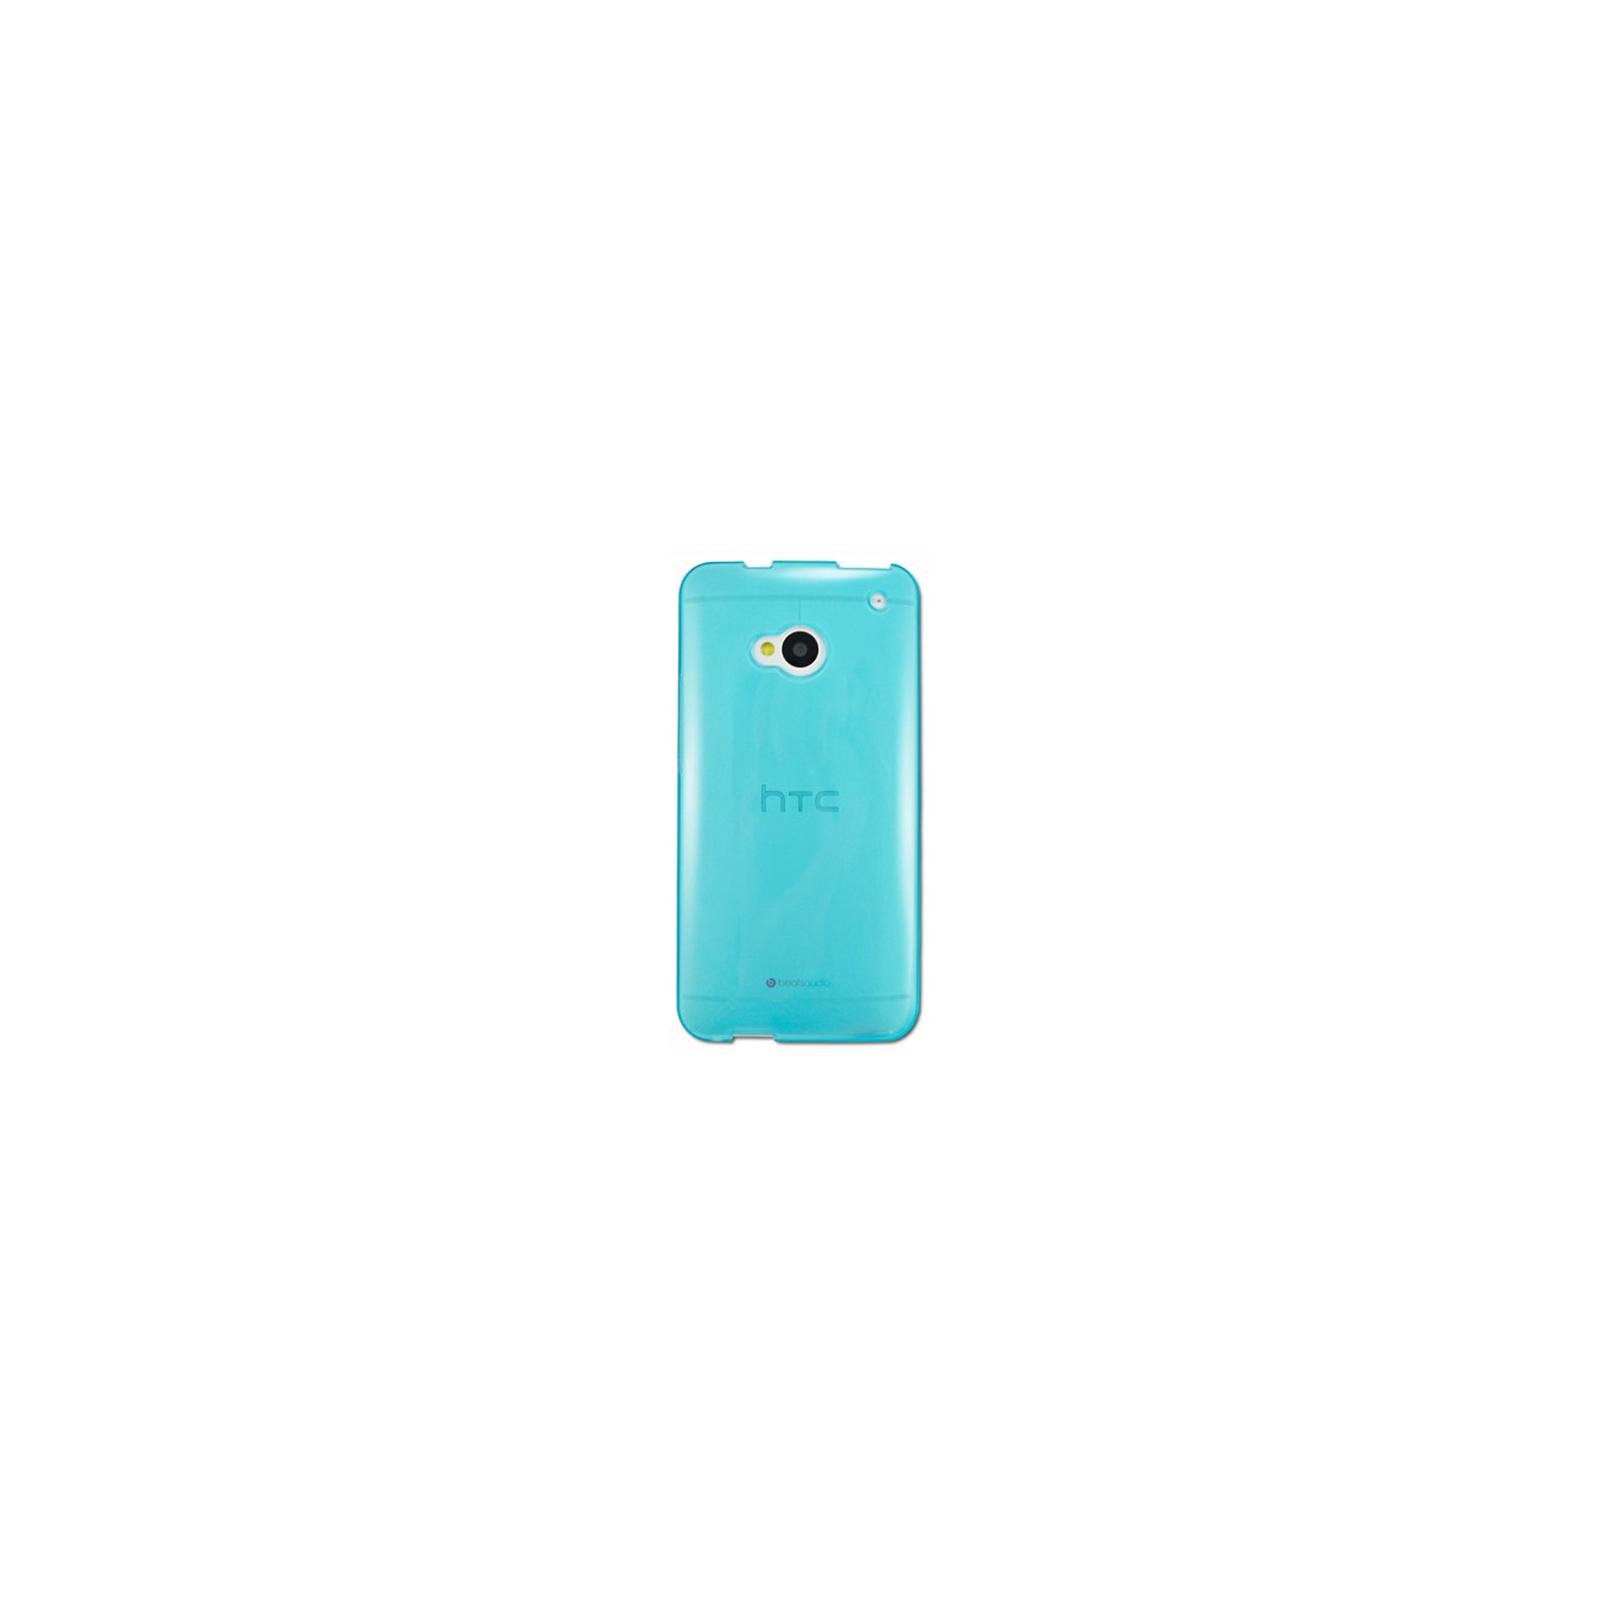 Чехол для моб. телефона Simply Design HTC ONE /TPU Blue (SD-9654)